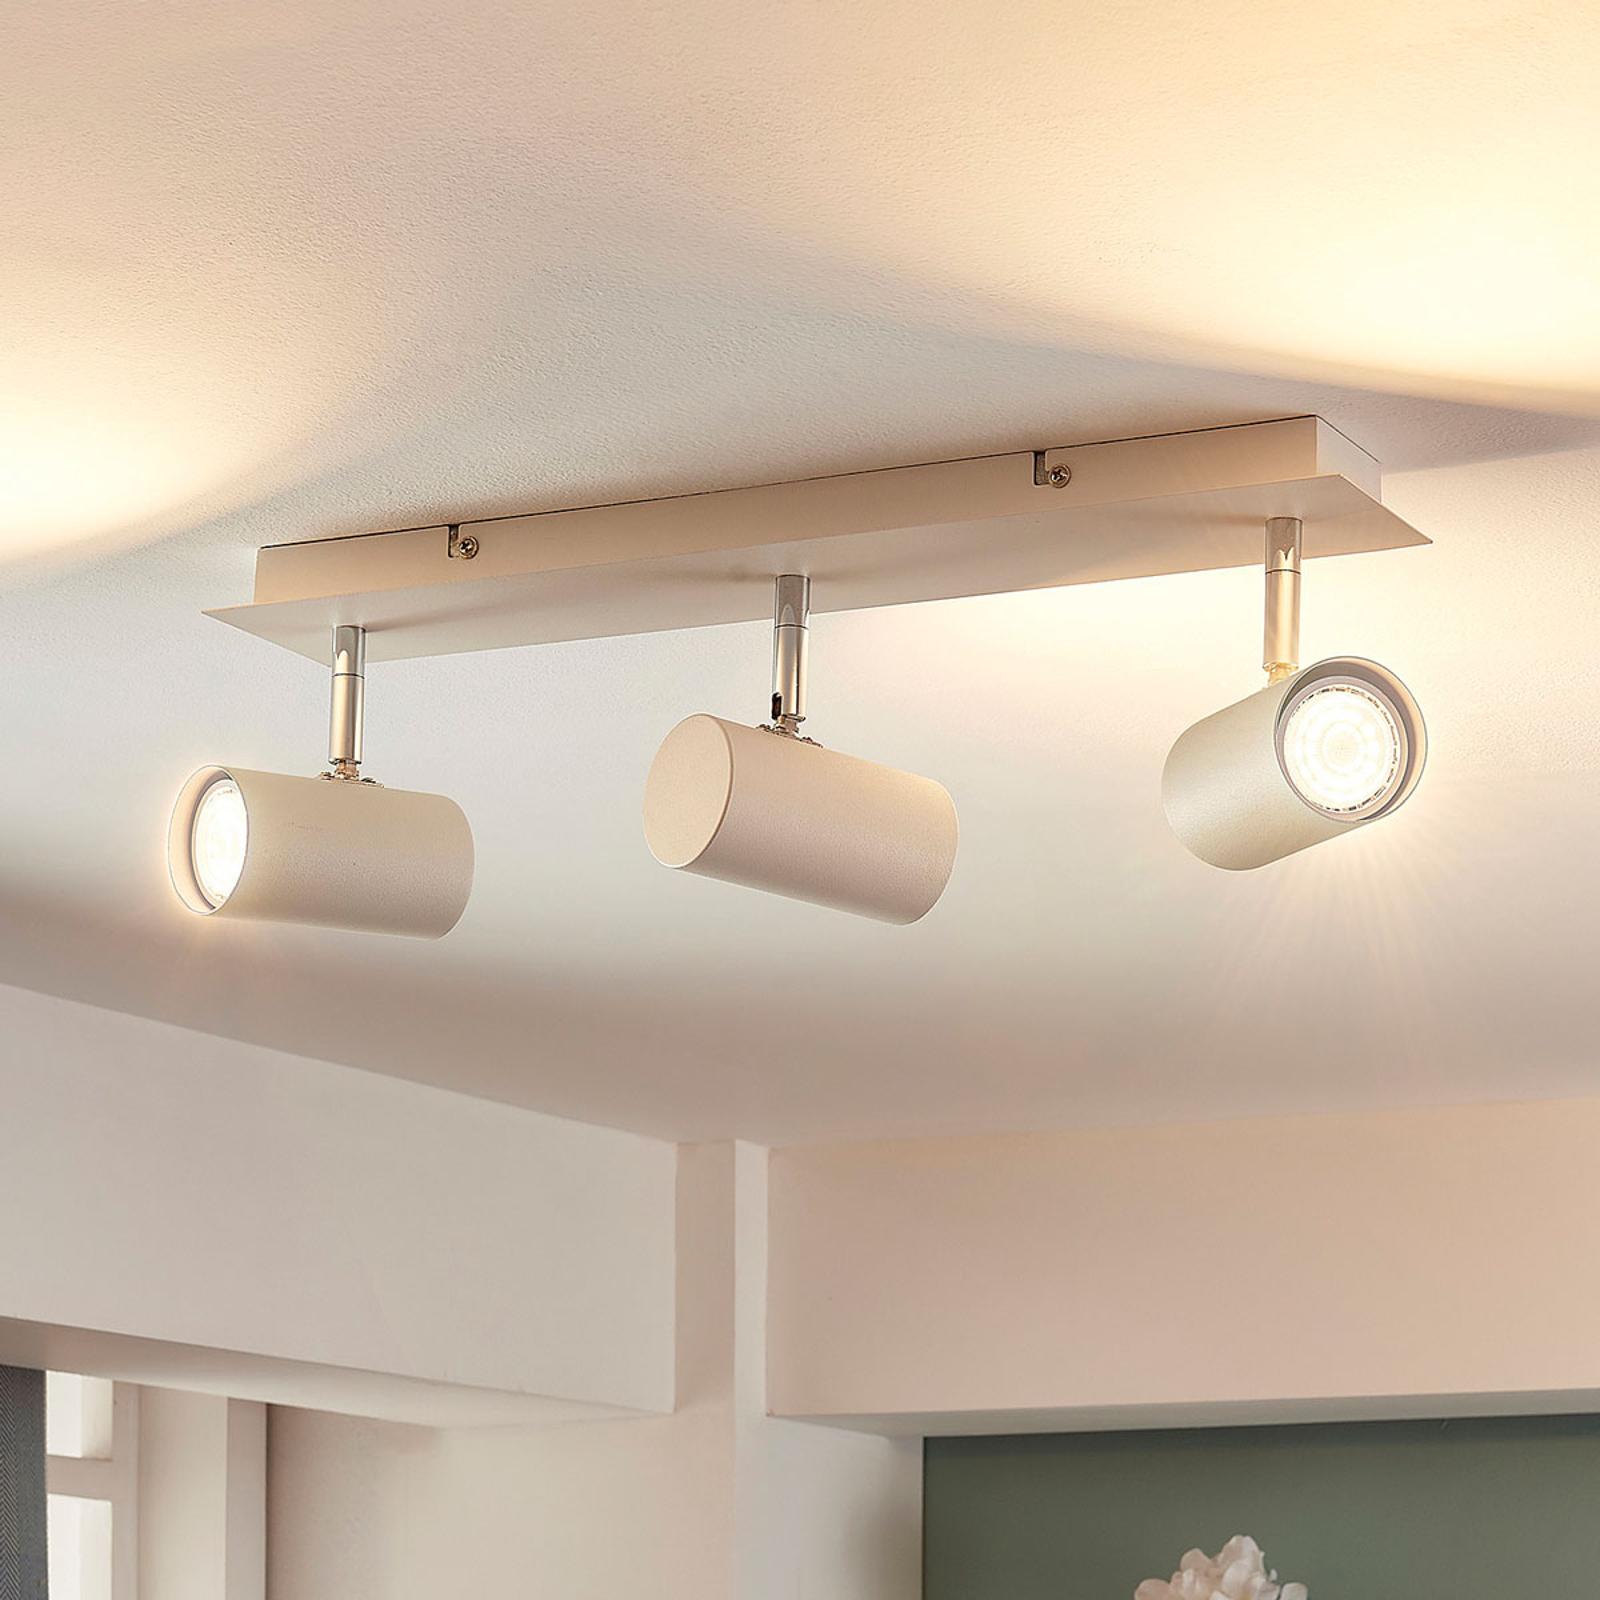 3.lamps LED plafondlamp IIuk in wit